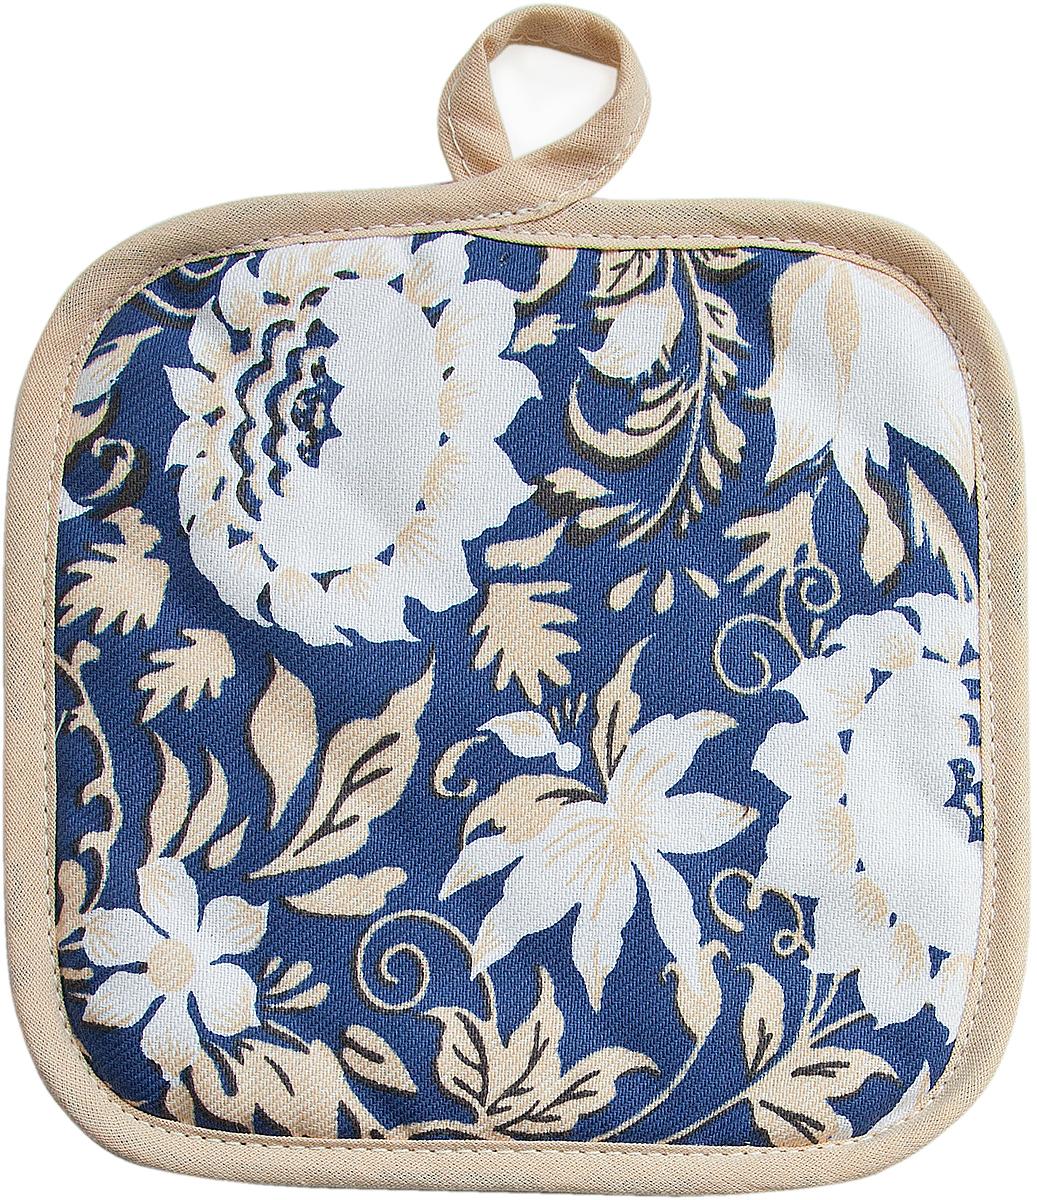 Прихватка Bonita Белые росы, 18 х 18 см полотенце кухонное bonita белые росы цвет белый бежевый 35 х 61 см